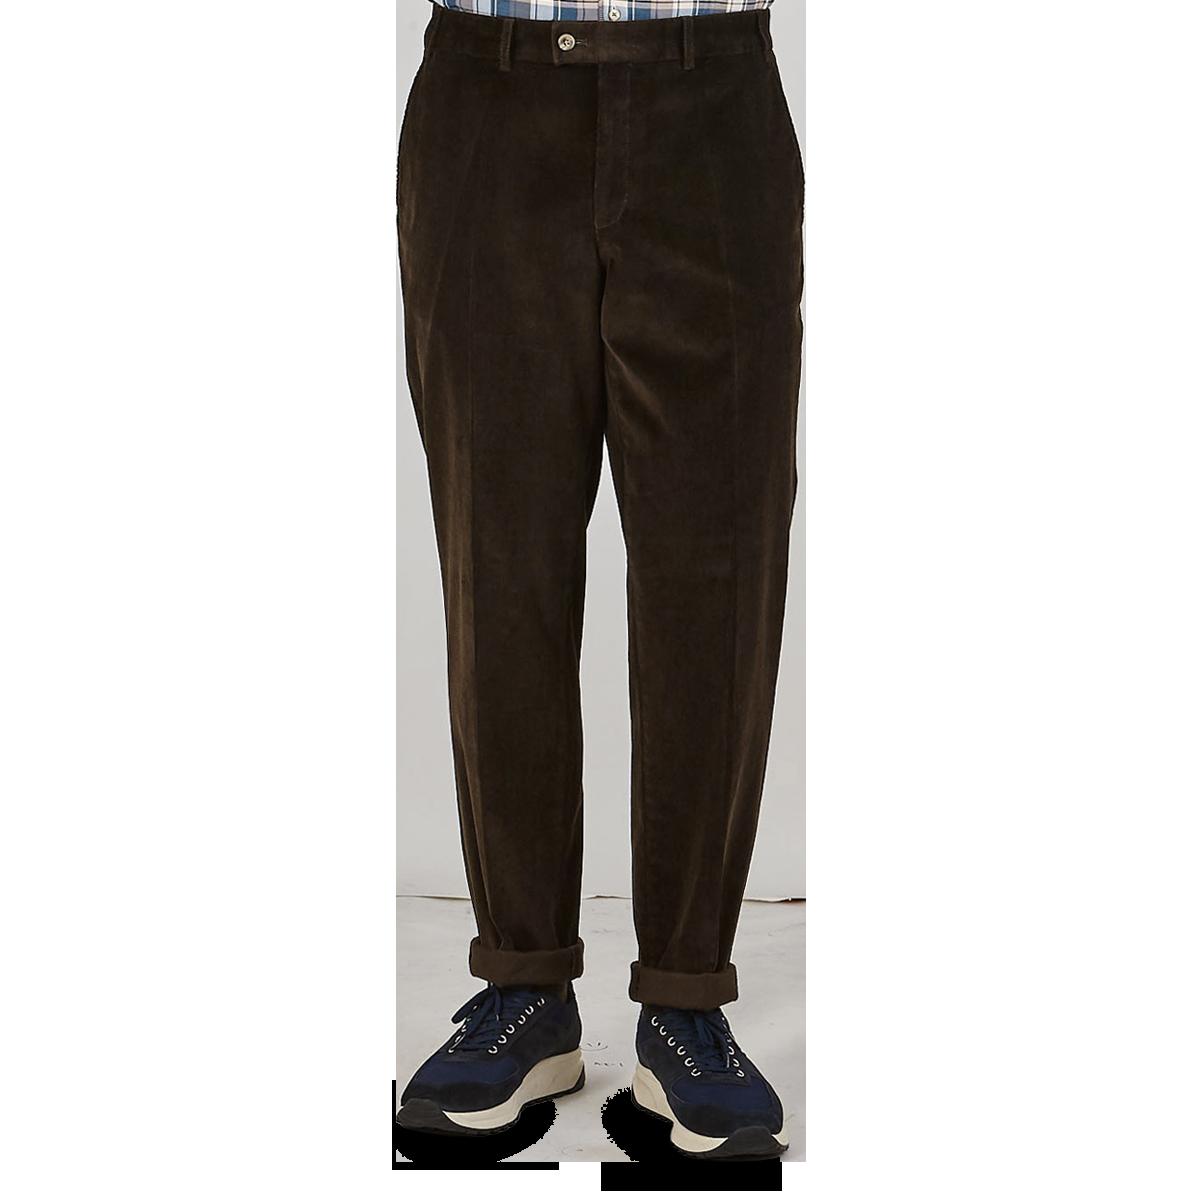 Hiltl Brown Cotton Corduroy Regular Fit Chinos Front